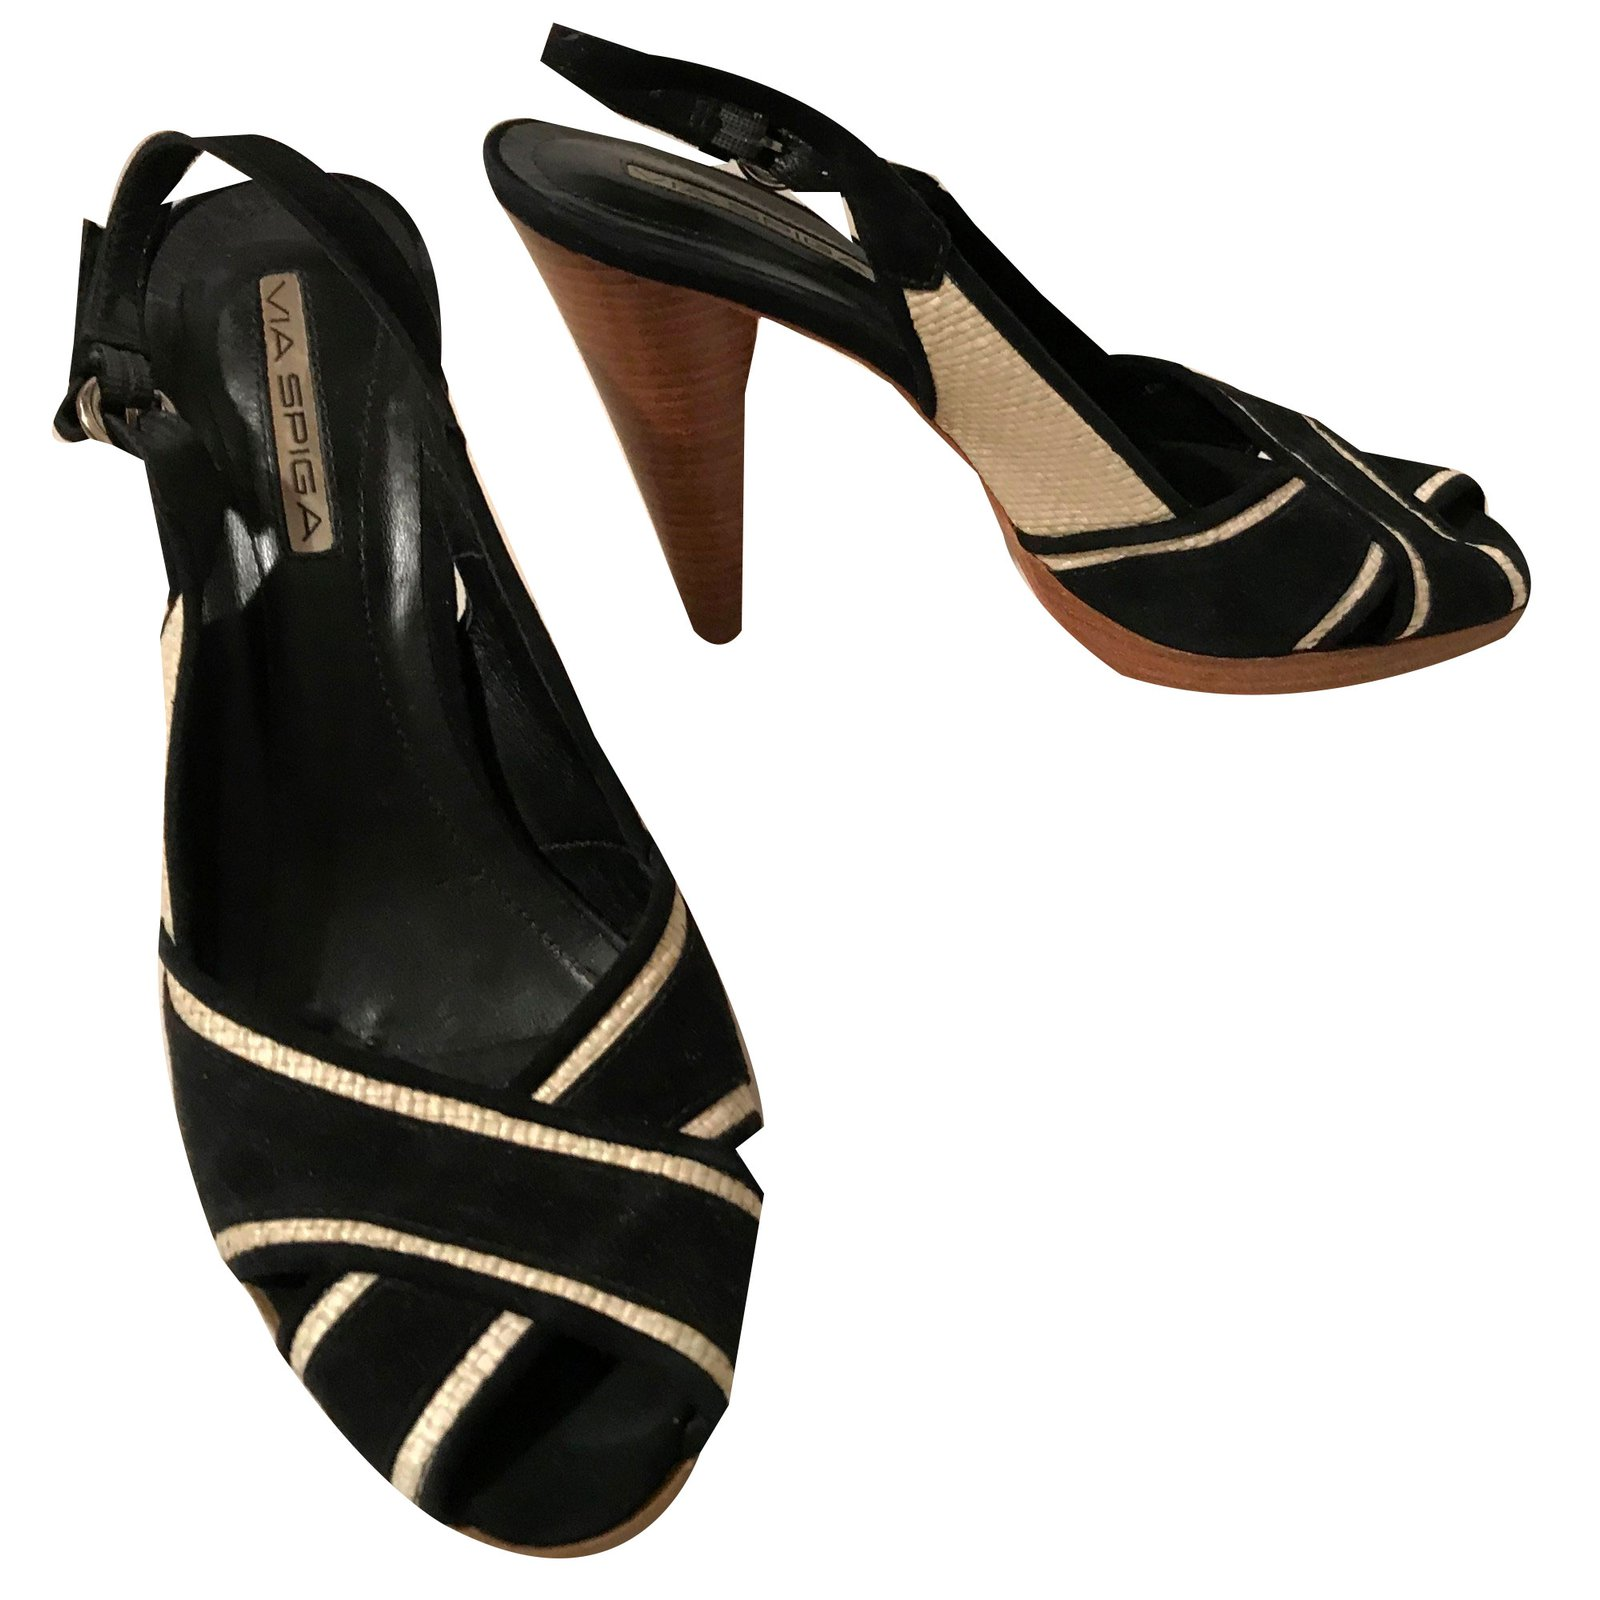 Autre Marque Via Spiga Sandals Straw